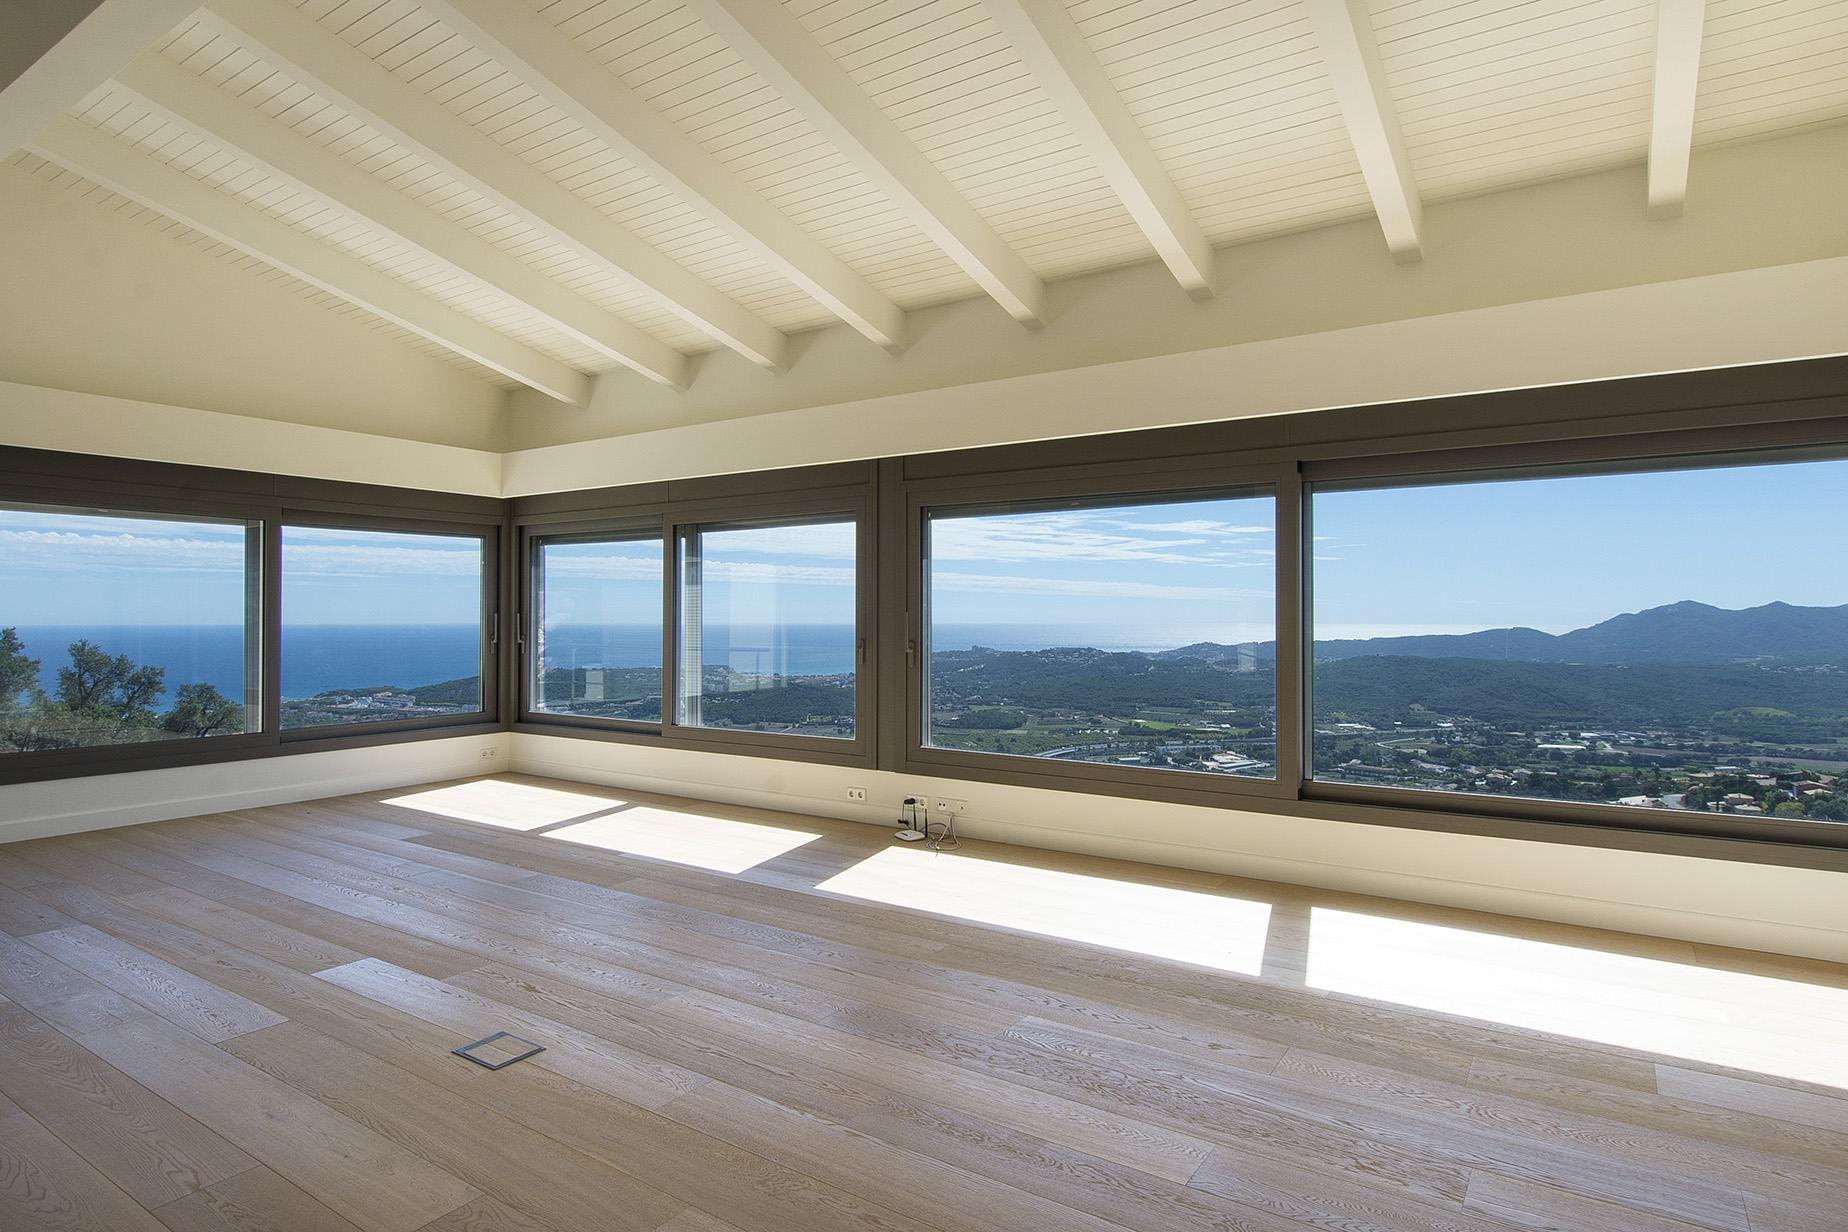 Single Family Home for Sale at Newly built villa with panoramic sea views Playa De Aro, Costa Brava 17250 Spain